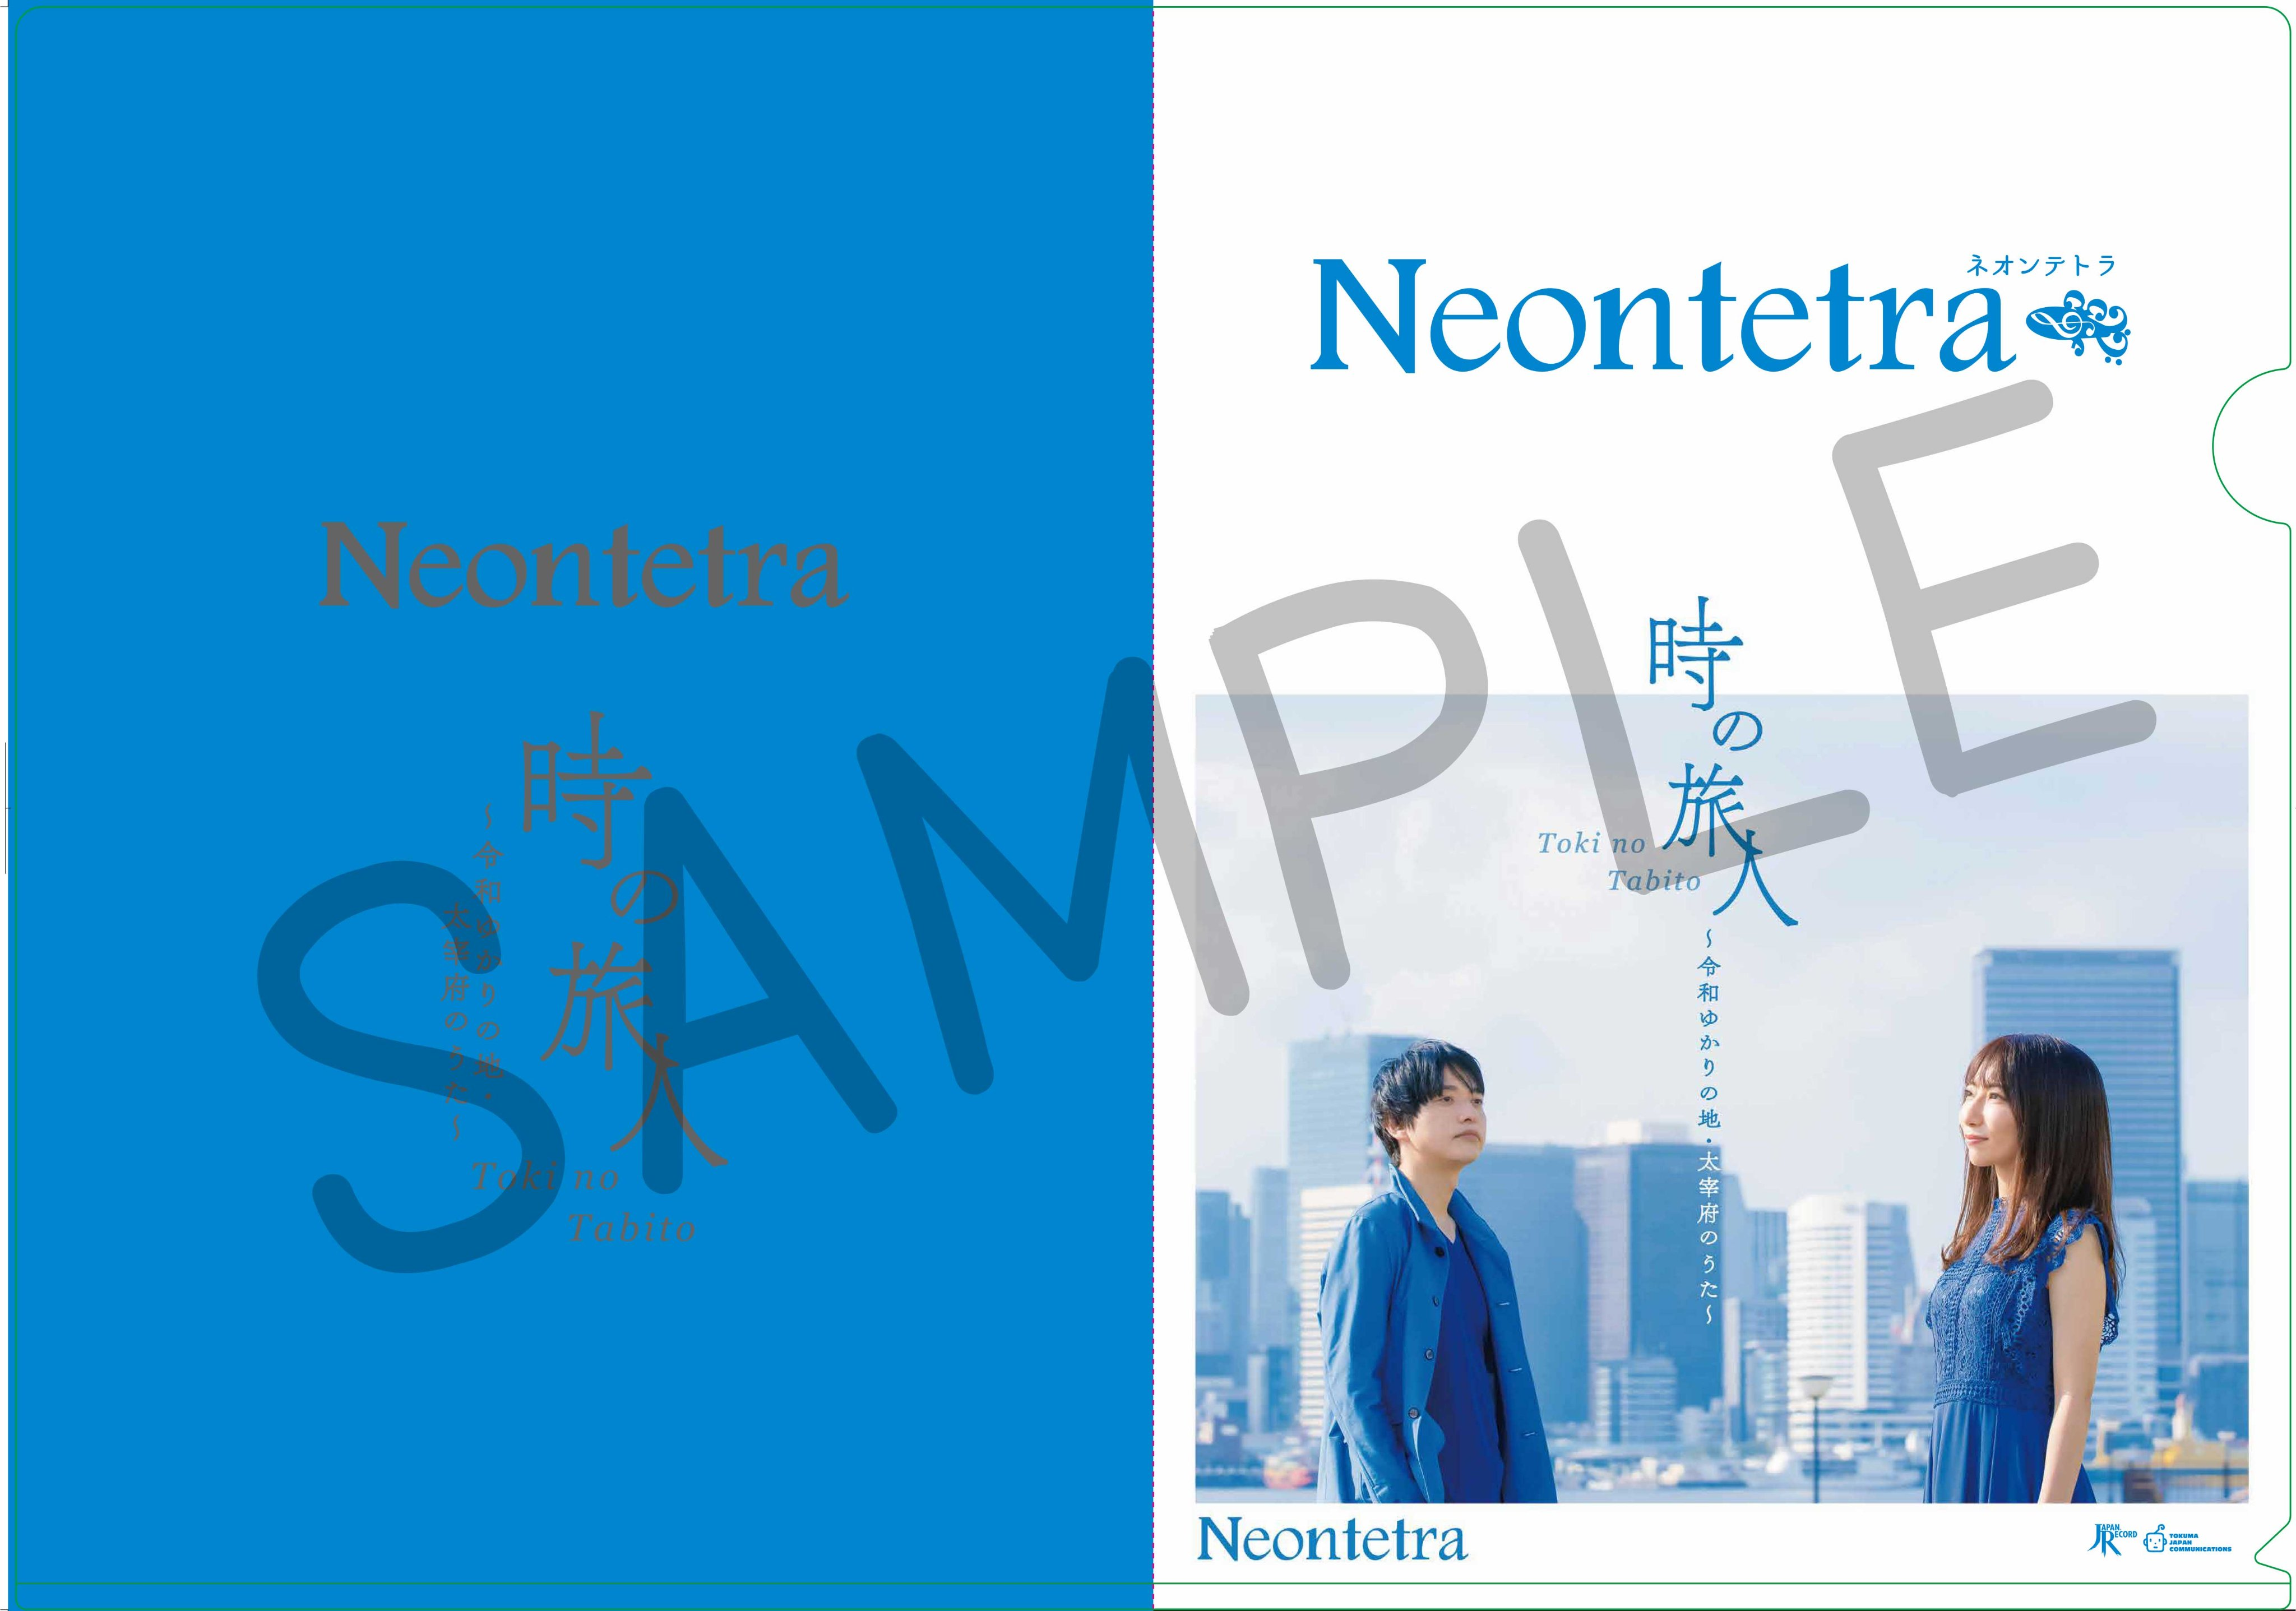 Neontetra_radio_kyusyu